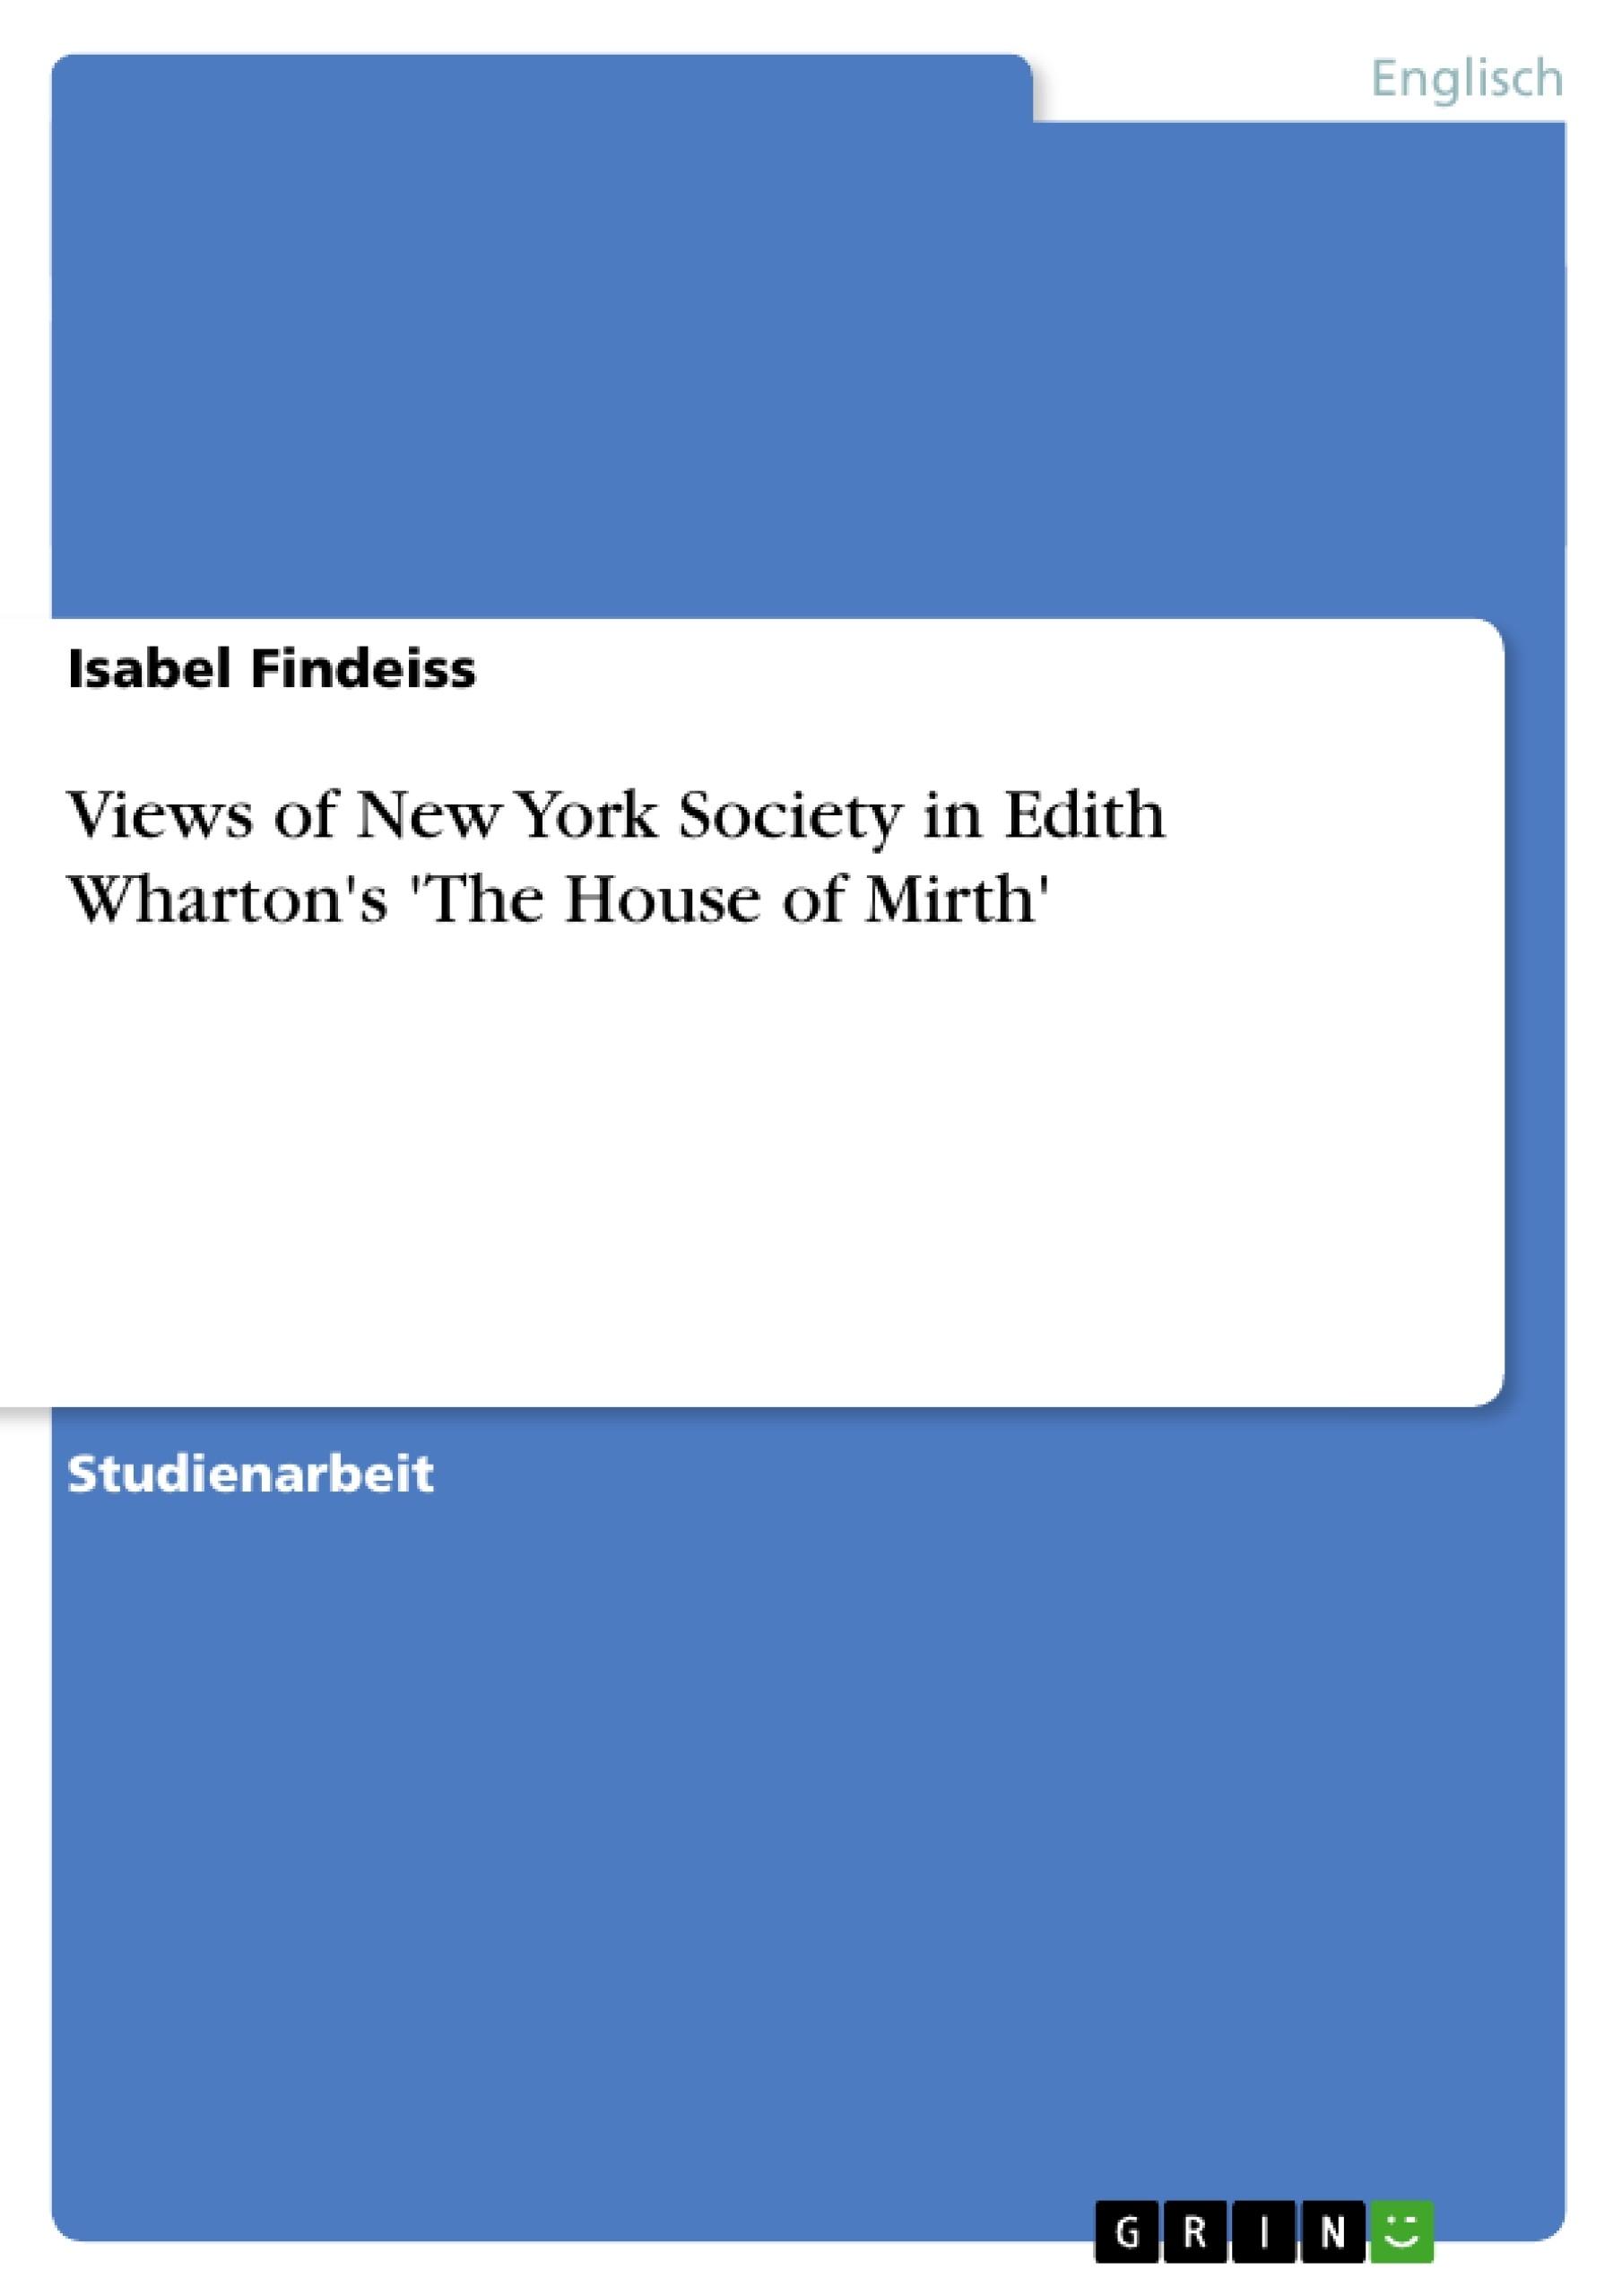 Titel: Views of New York Society in Edith Wharton's 'The House of Mirth'